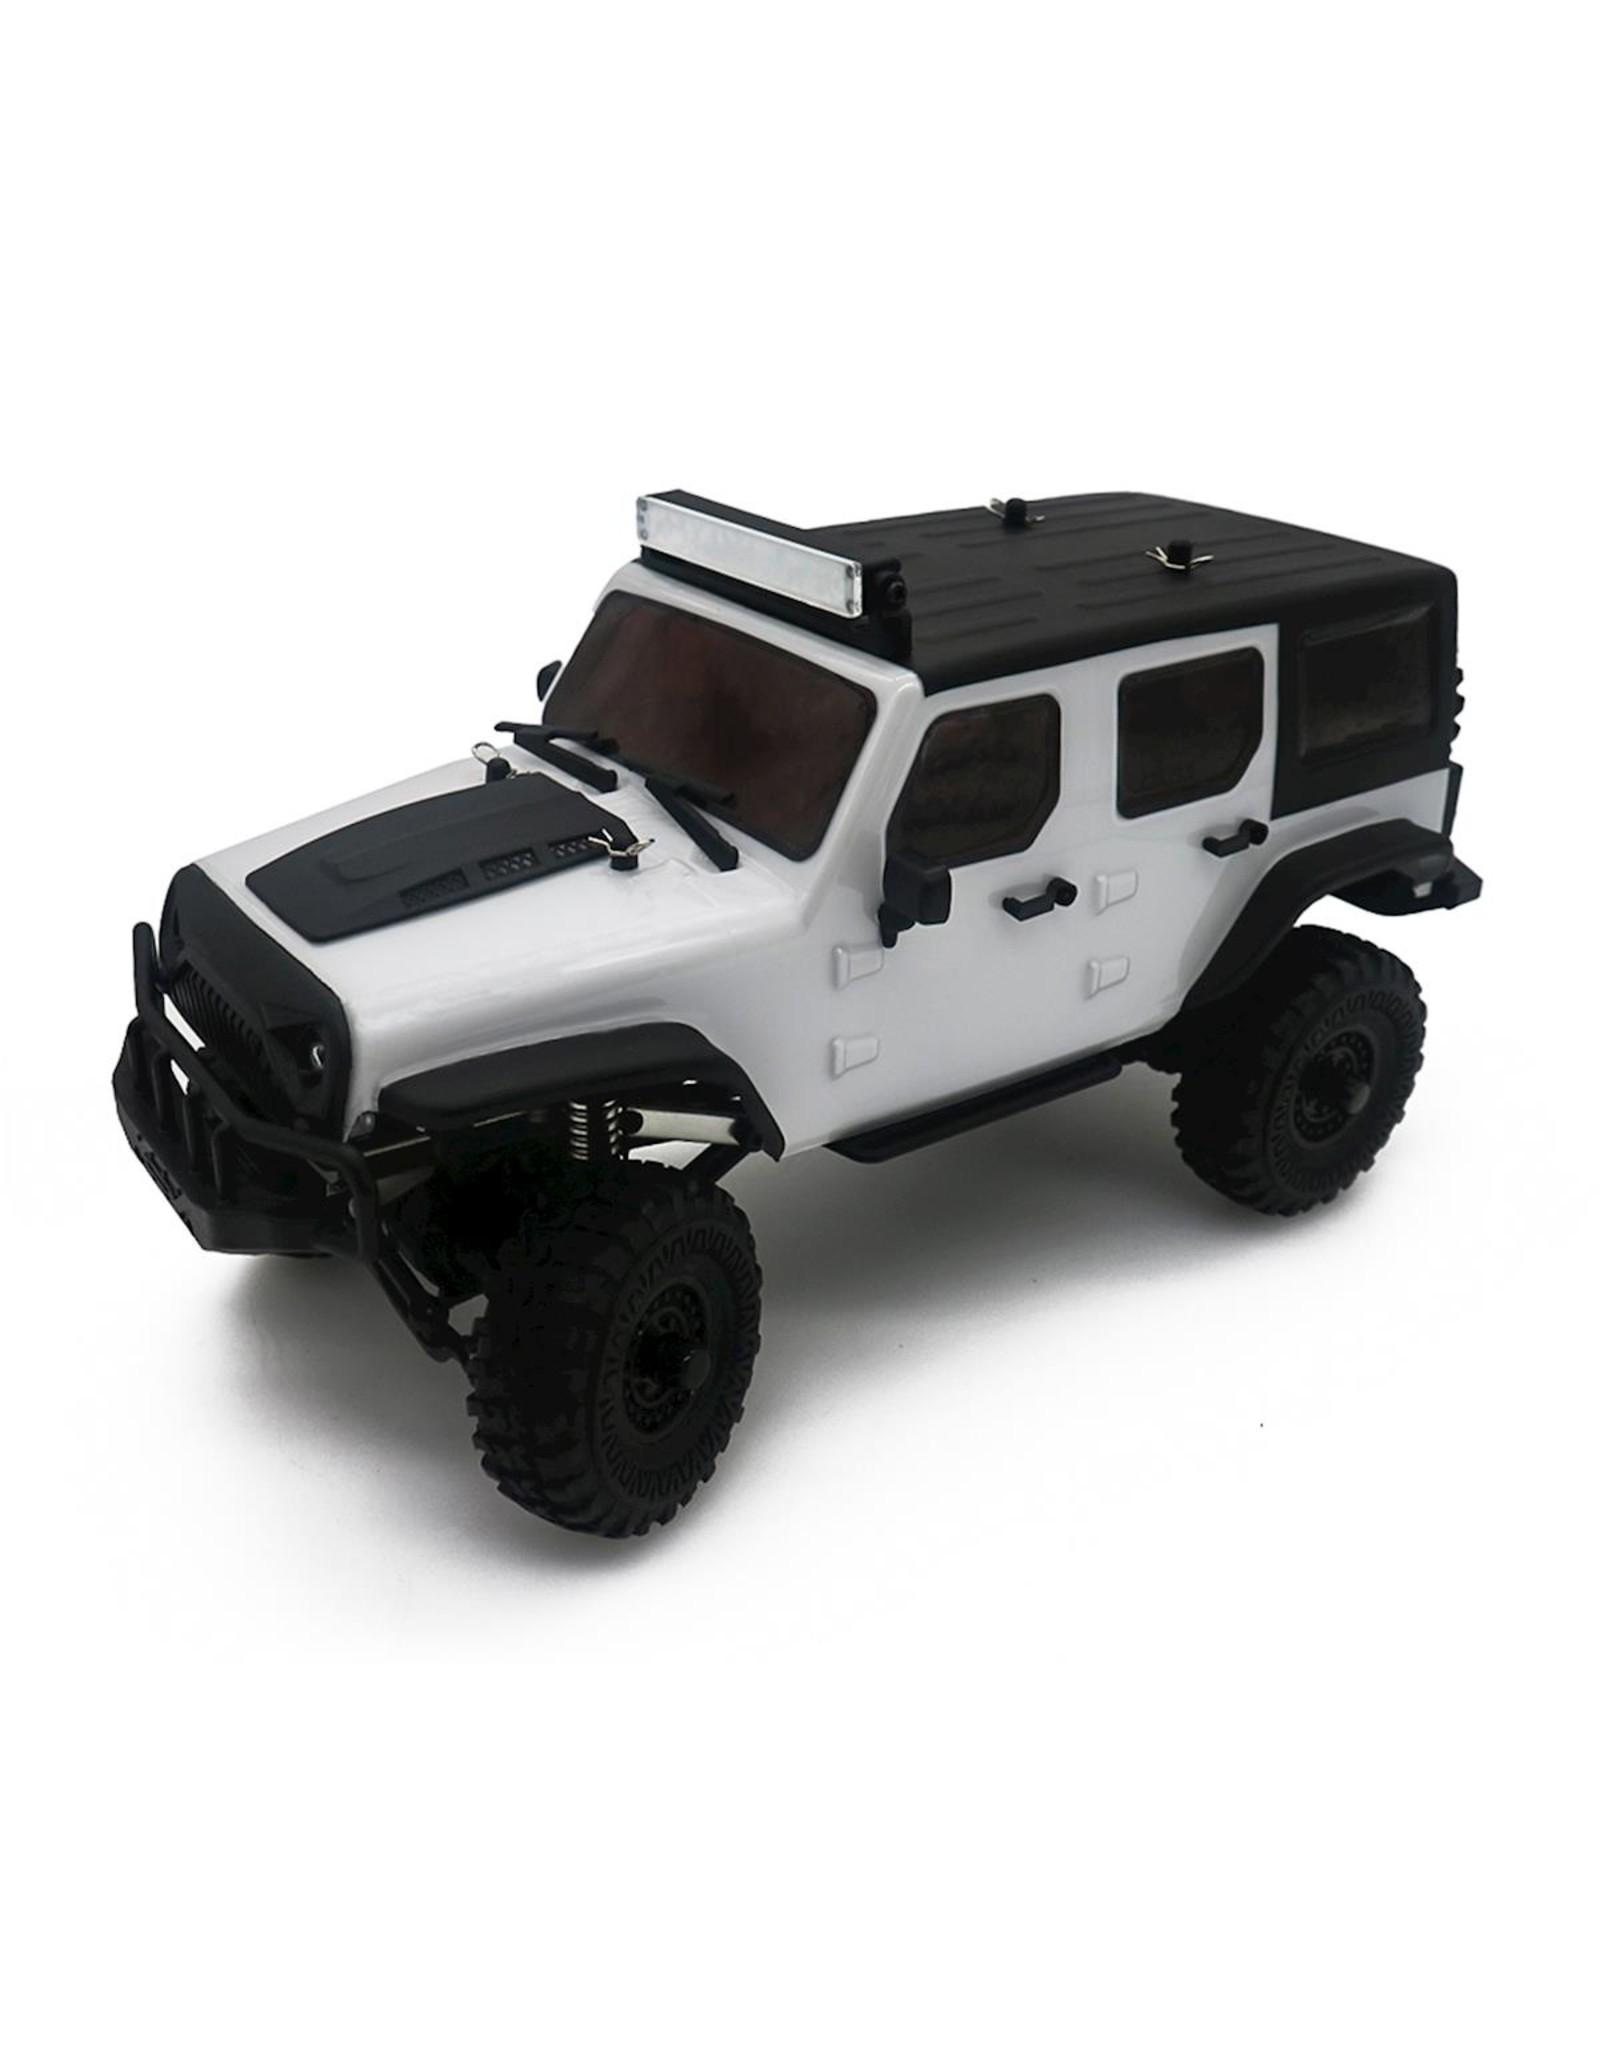 Panda 1/18 Tetra X1 RTR Mini Crawler - White